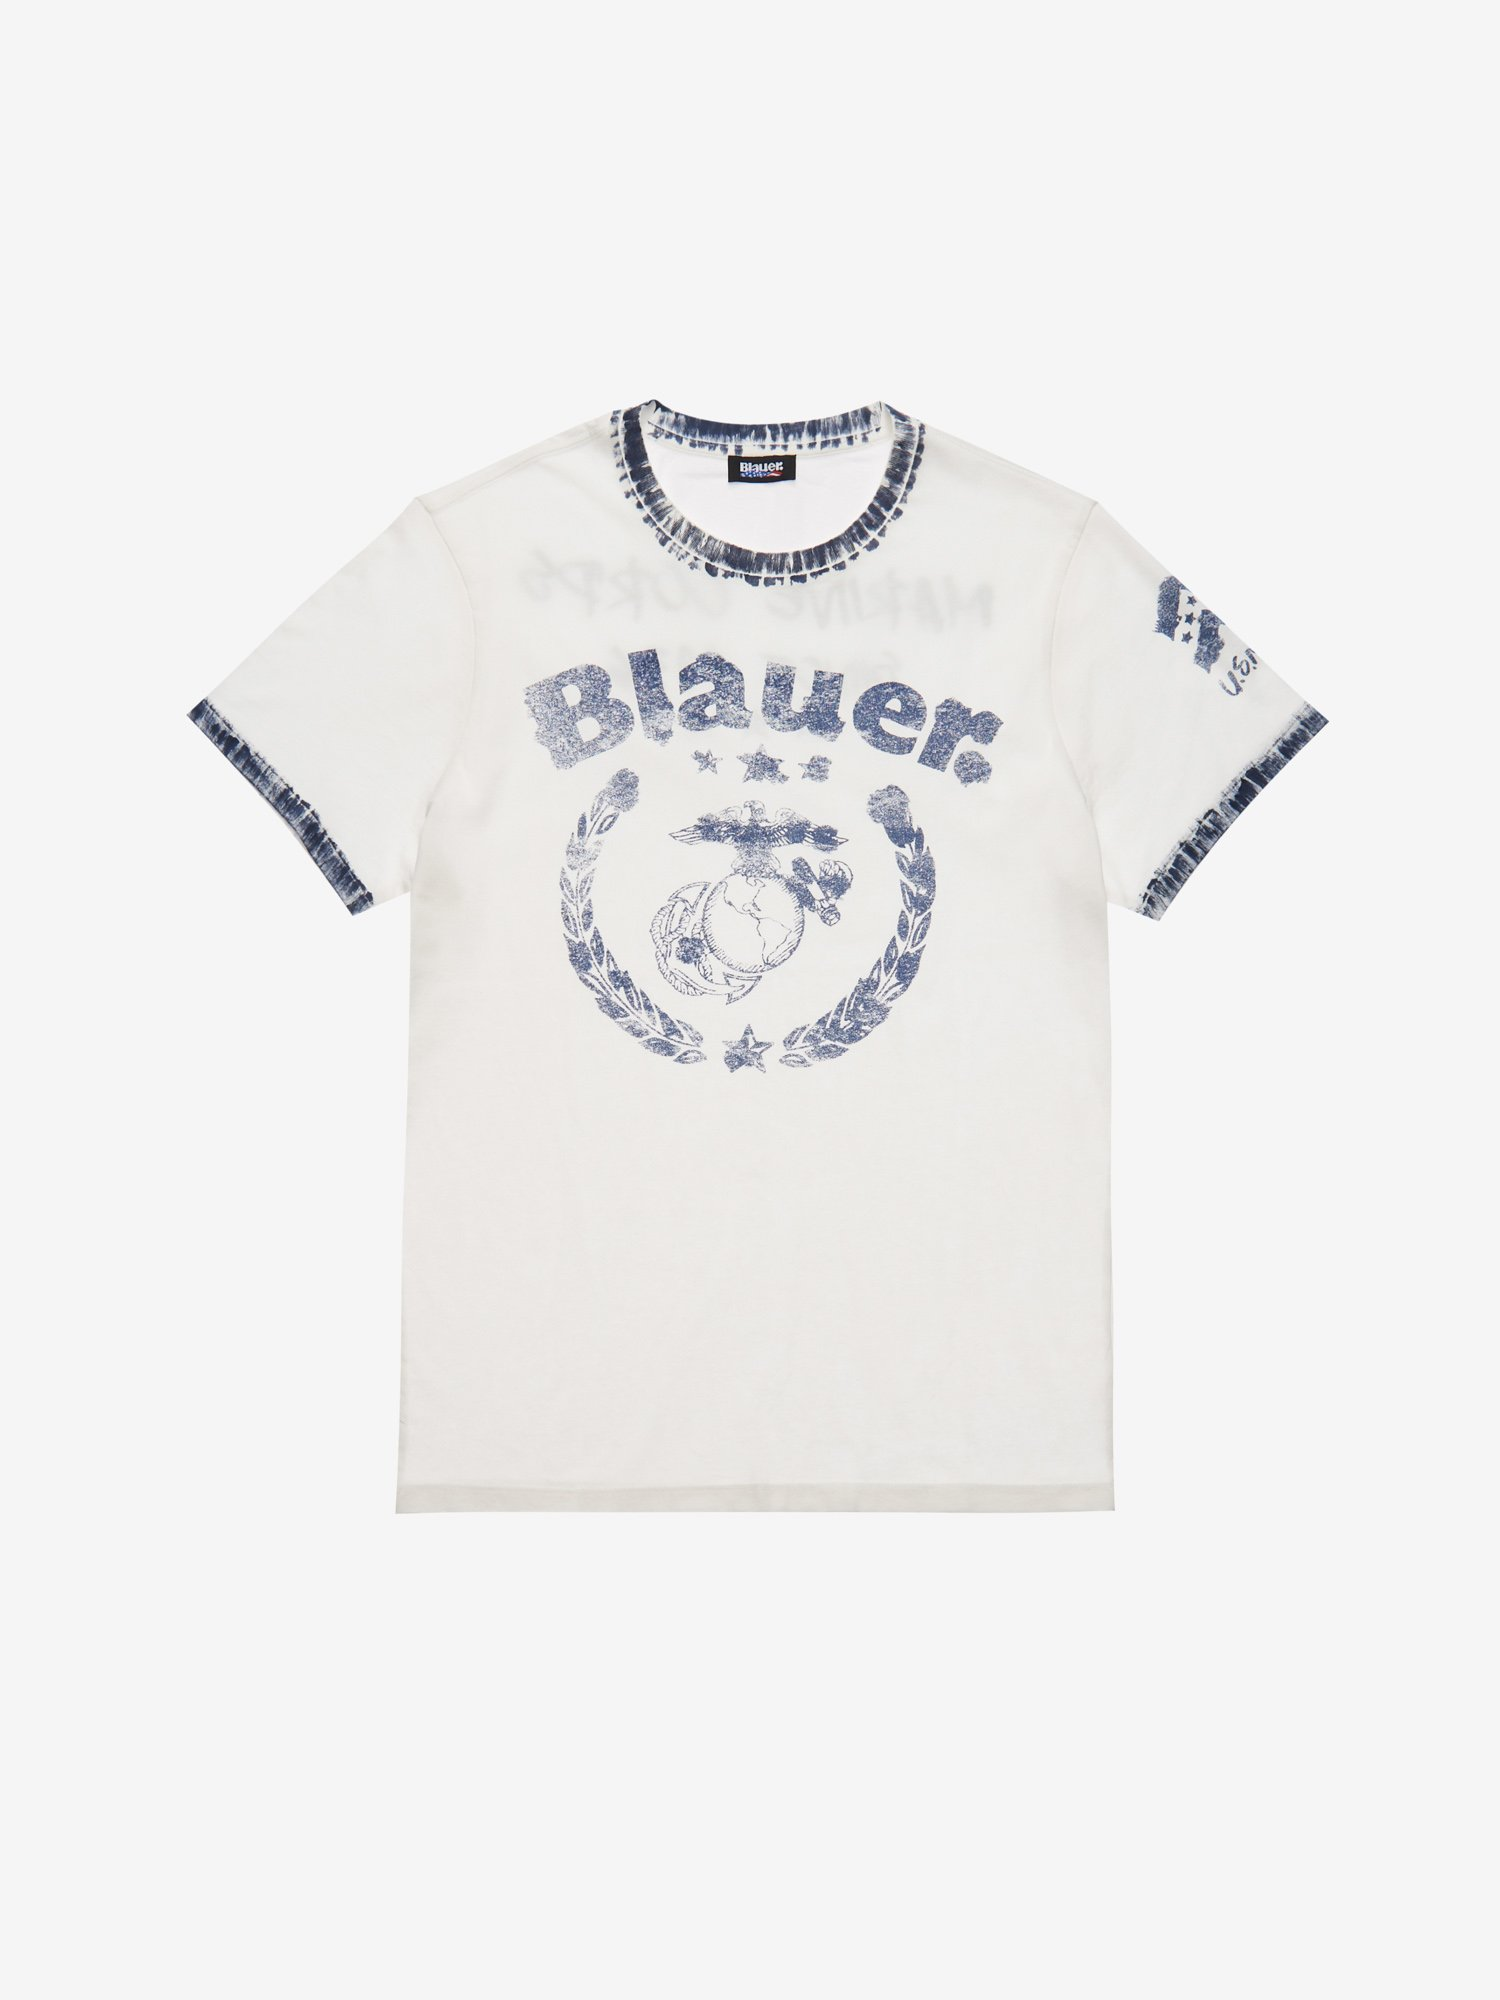 Blauer - T-SHIRT MARINE - Avorio - Blauer